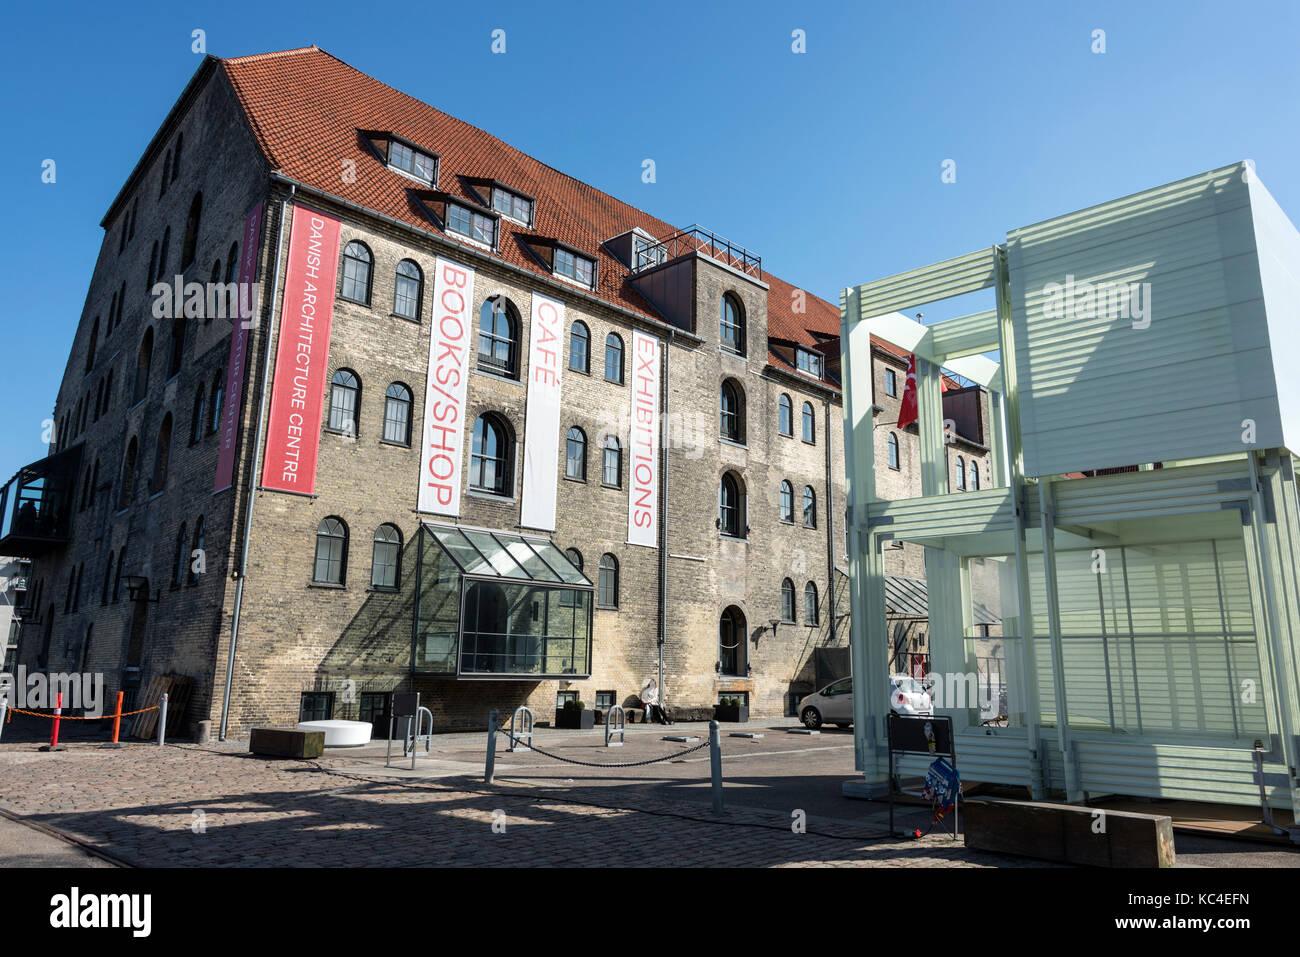 The Danish Architecture Centre (DAC) on Strandgade Christianshavn side of Copenhagen in Denmark. It  is a communication - Stock Image